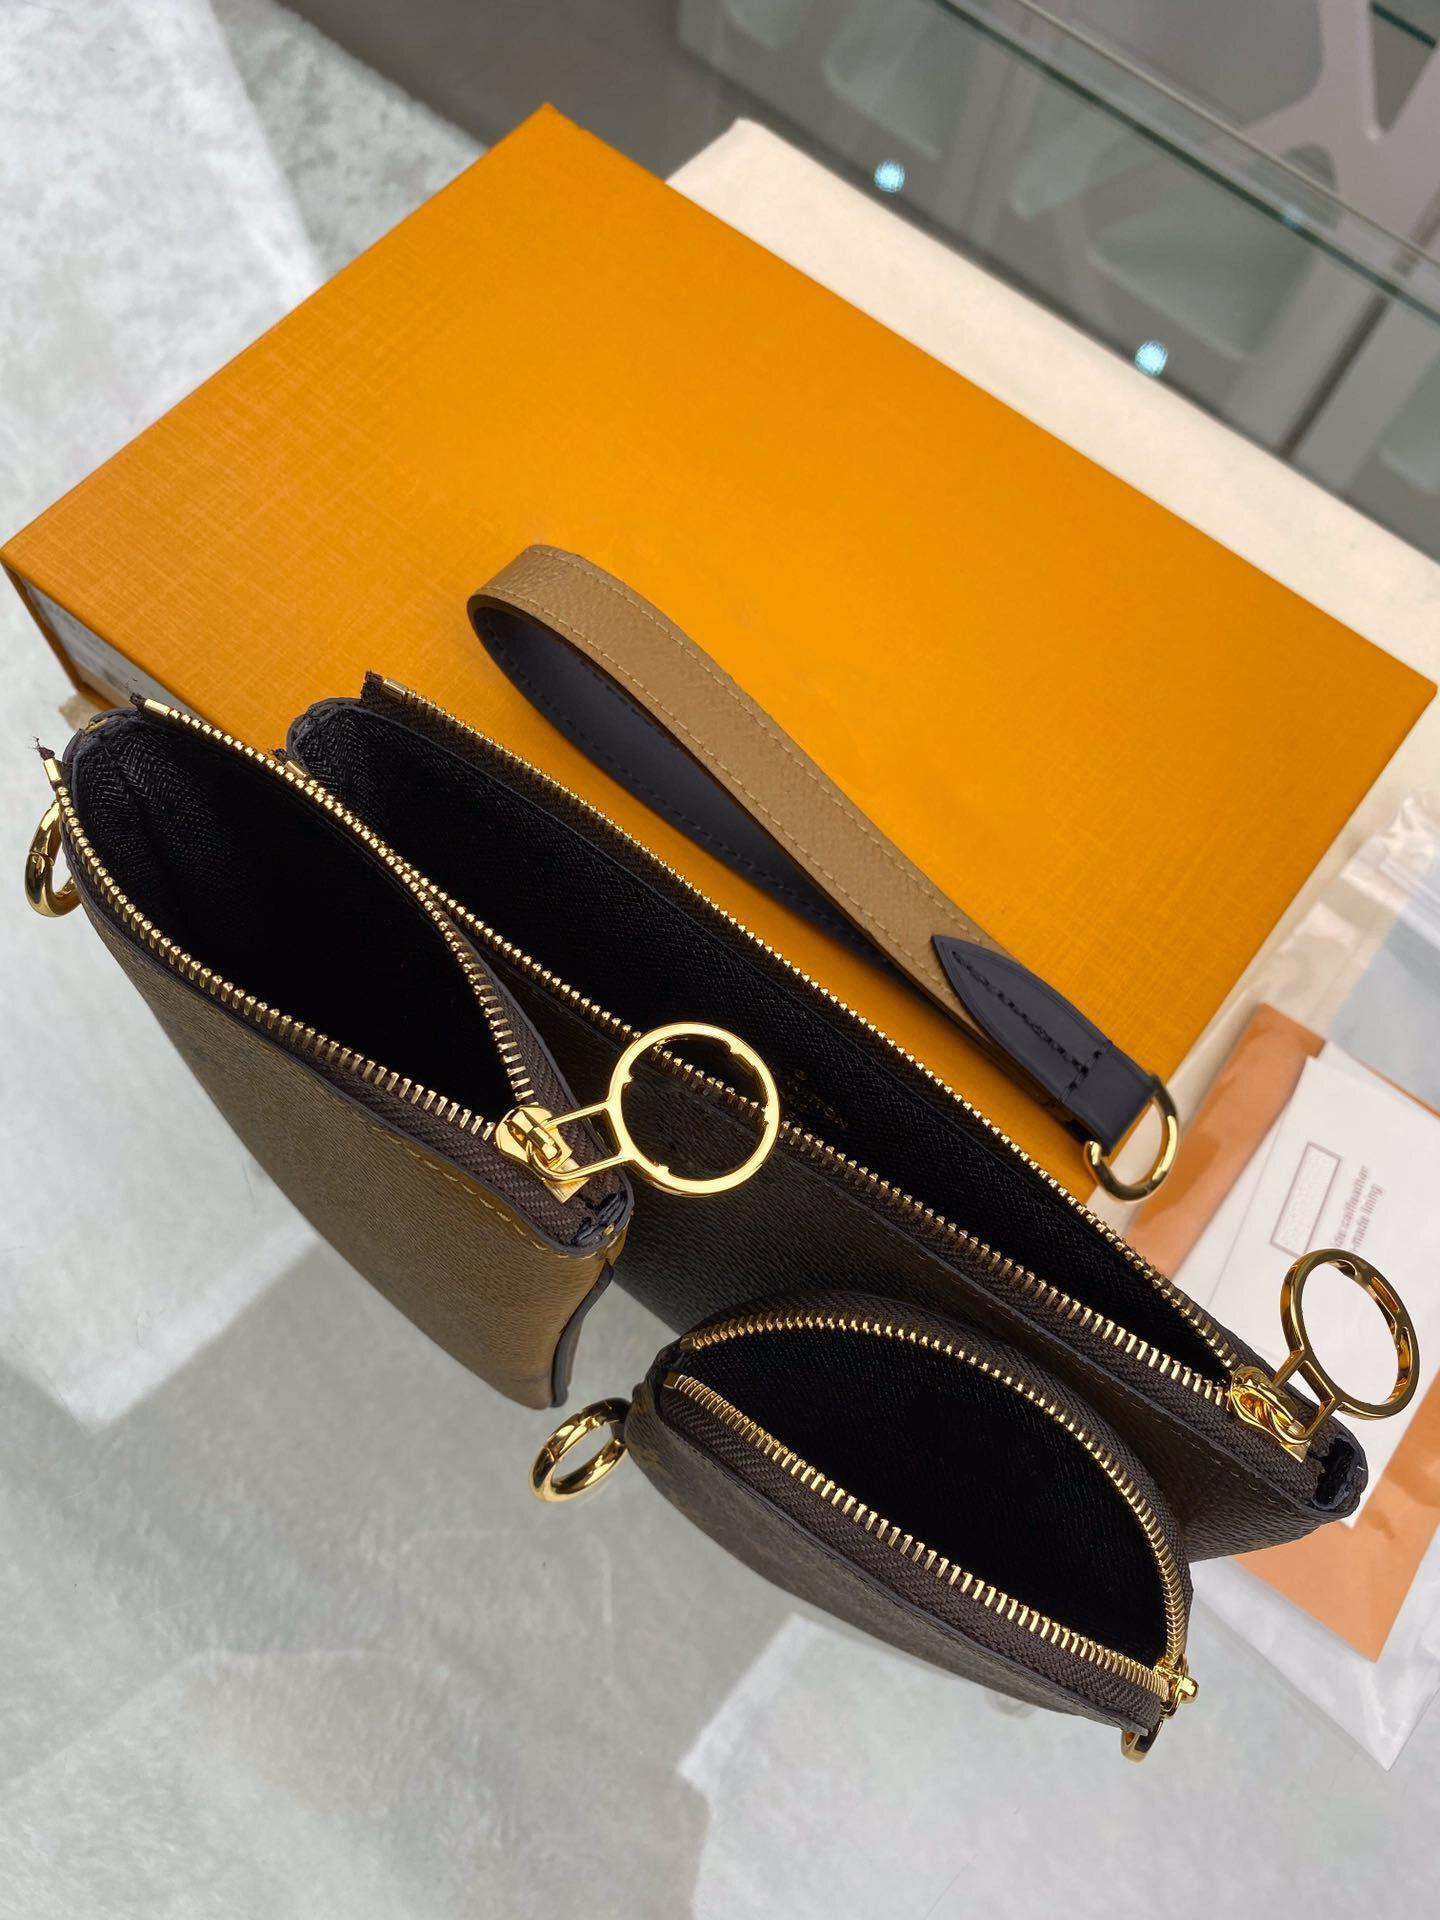 Luxury Designer Coin Purses Set 3-in-One Waistlet Change Pouch Round Square Zippy Wallets Reverse Colors Golden Zipper Flower Wistband